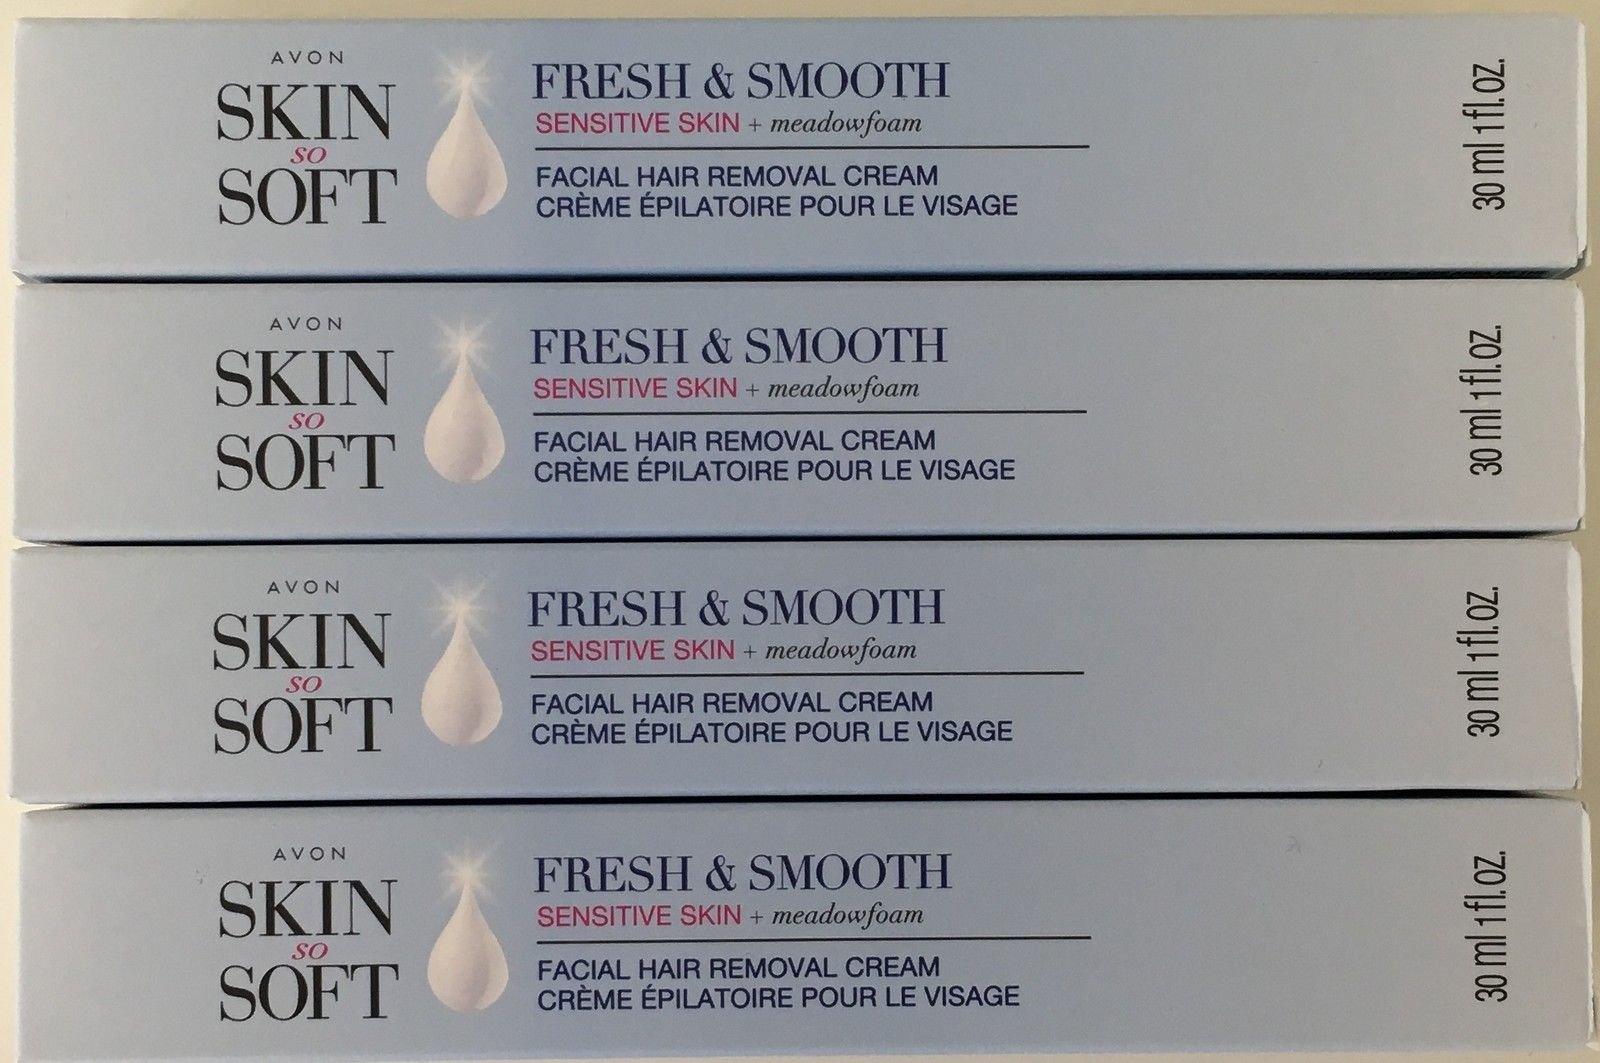 Avon Skin so Soft Fresh & Smooth Sensitive Skin Facial Hair Removal Cream 1 oz Each. A Lot of 4 by Skin so soft (Image #1)